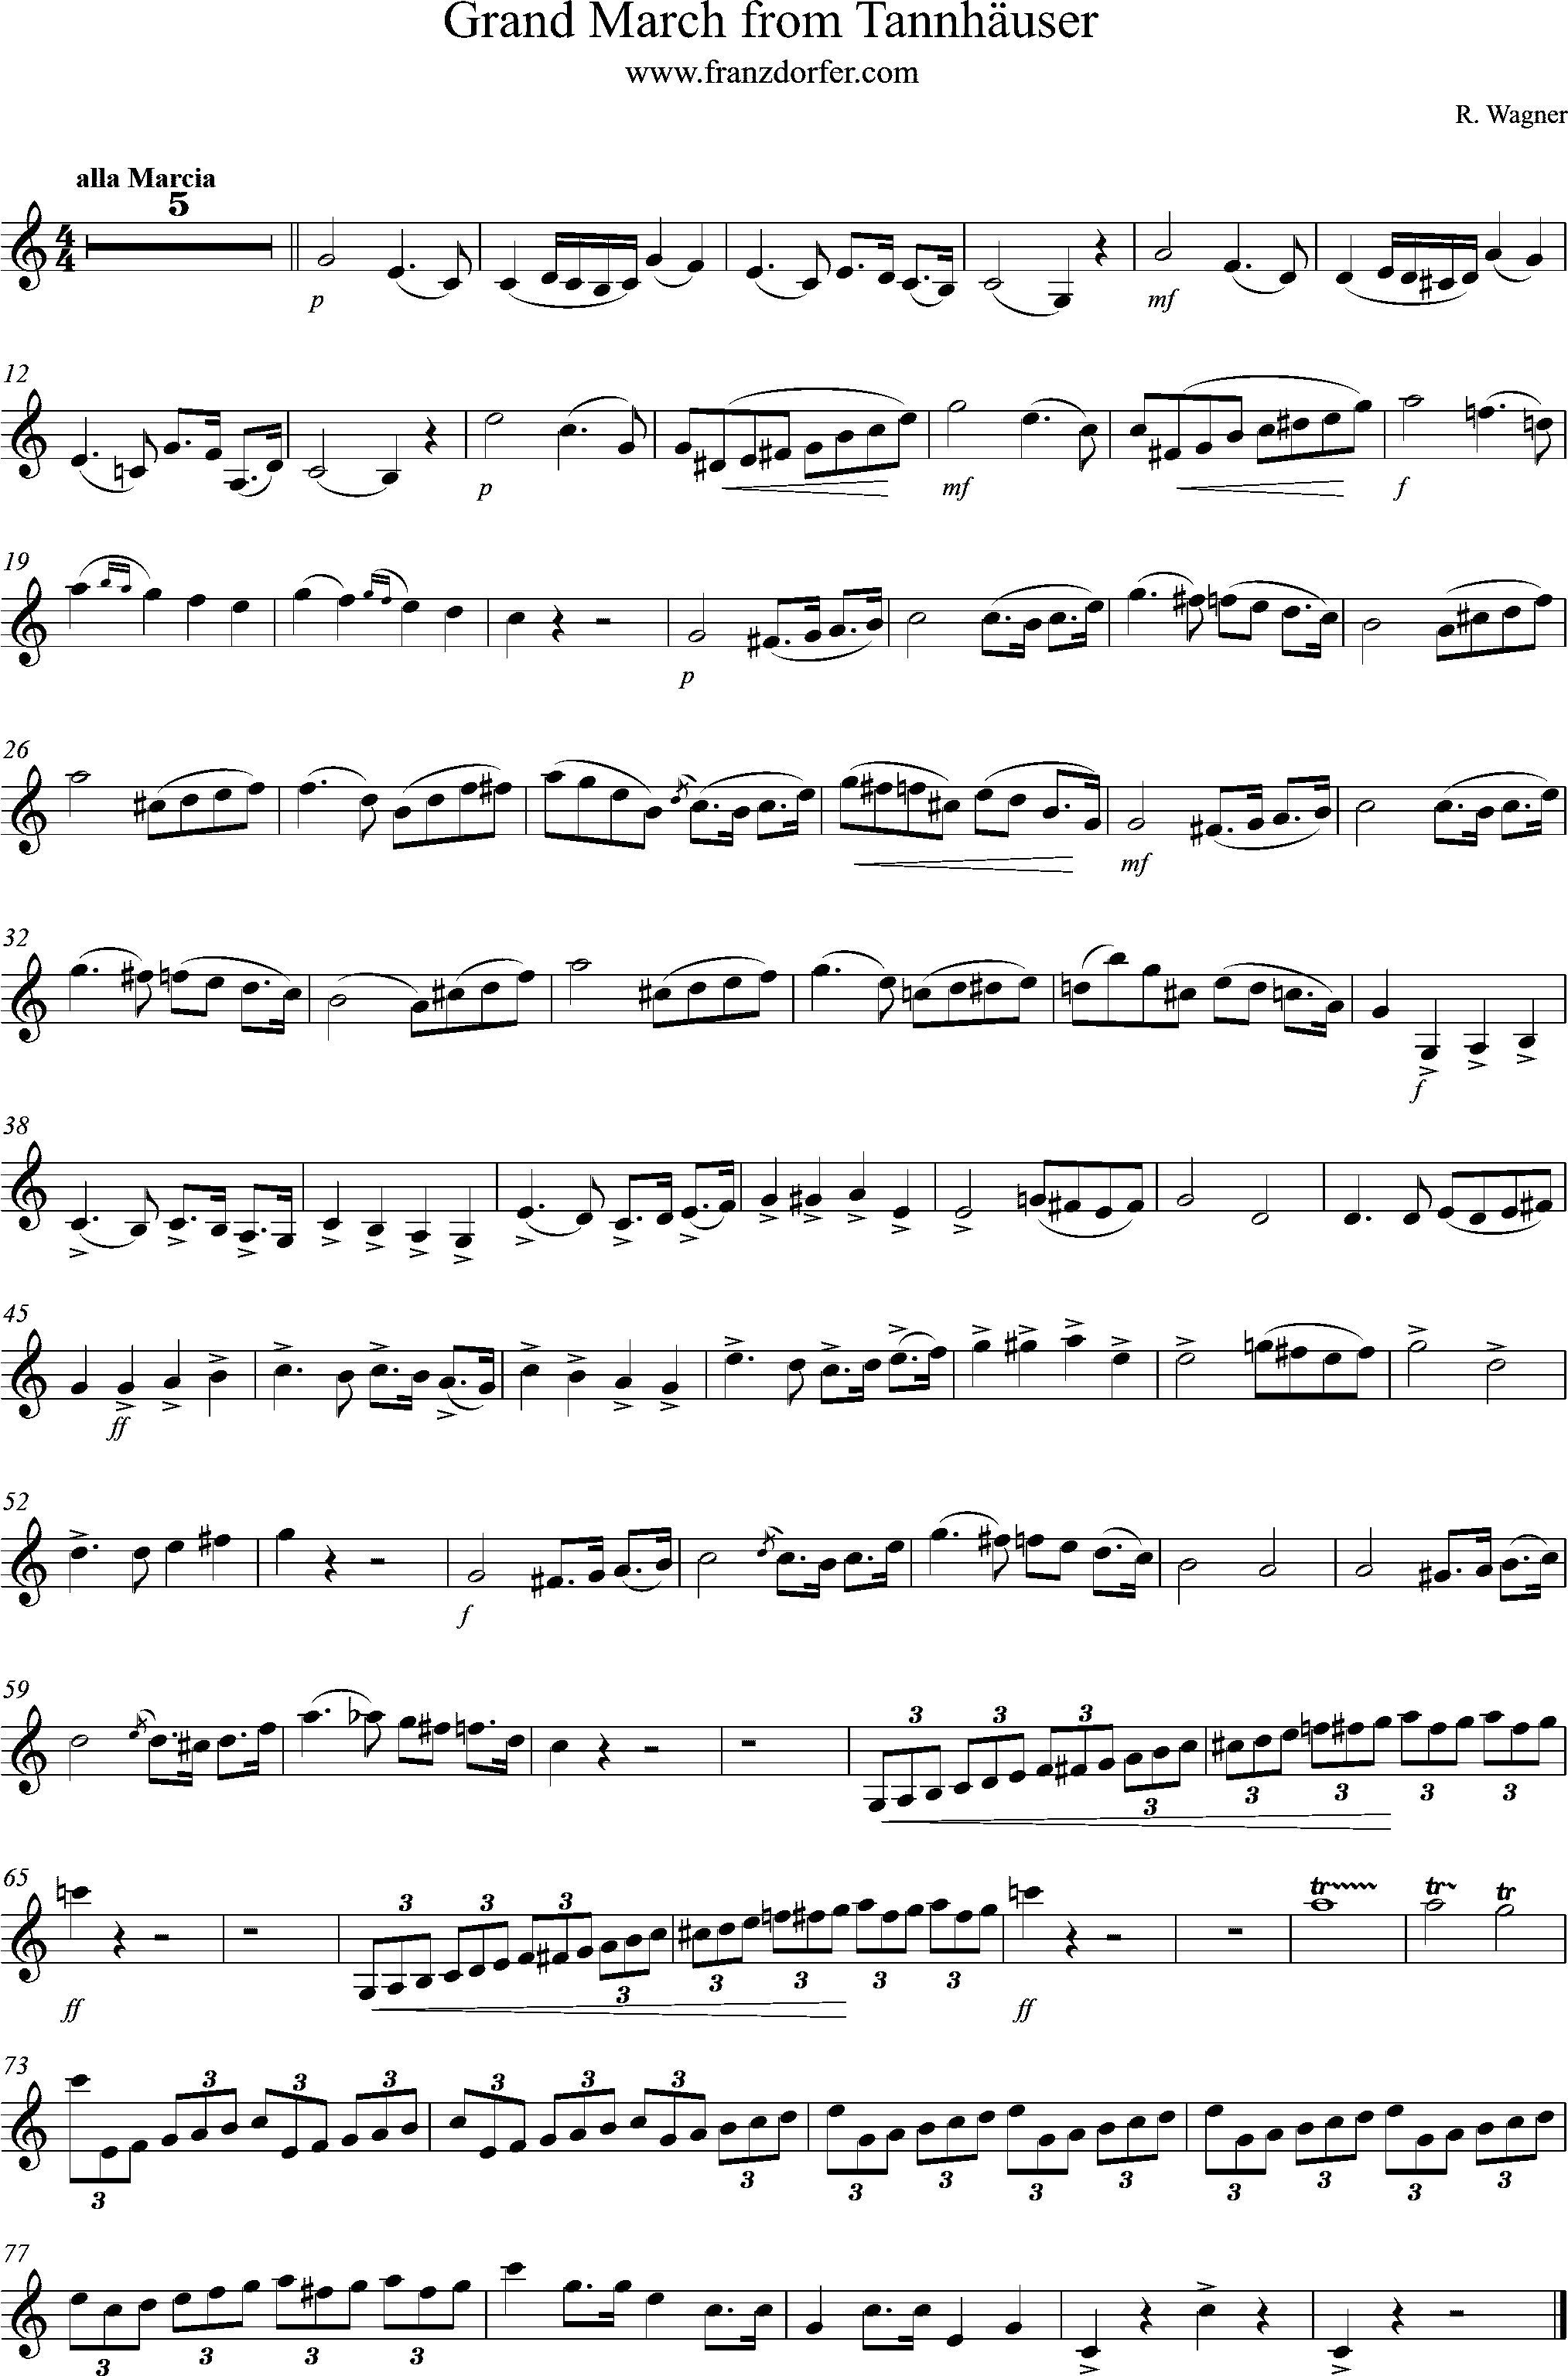 tannhäuser Grand March